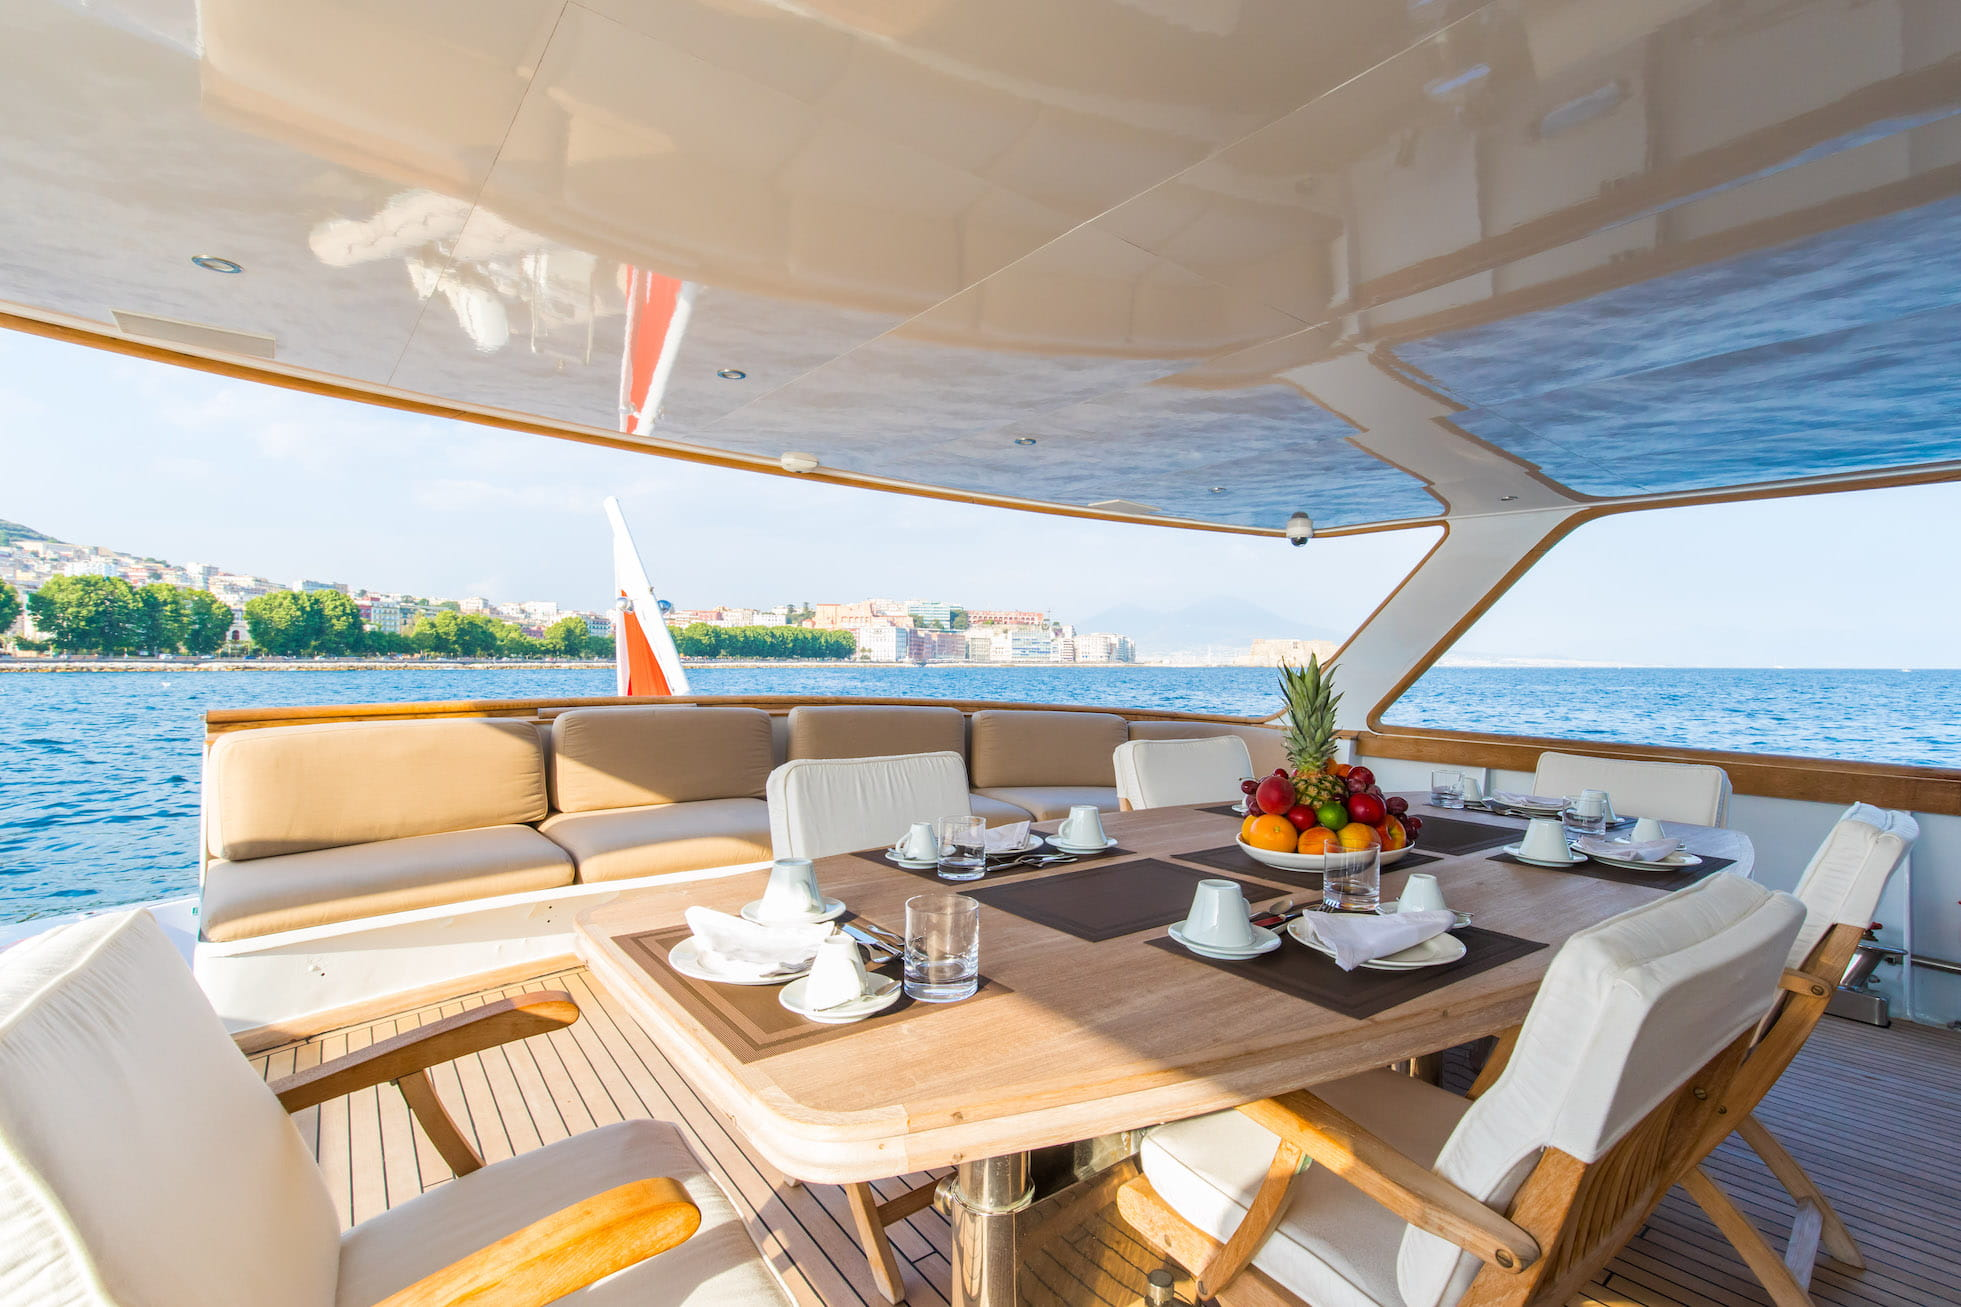 Spacious aft deck dining area